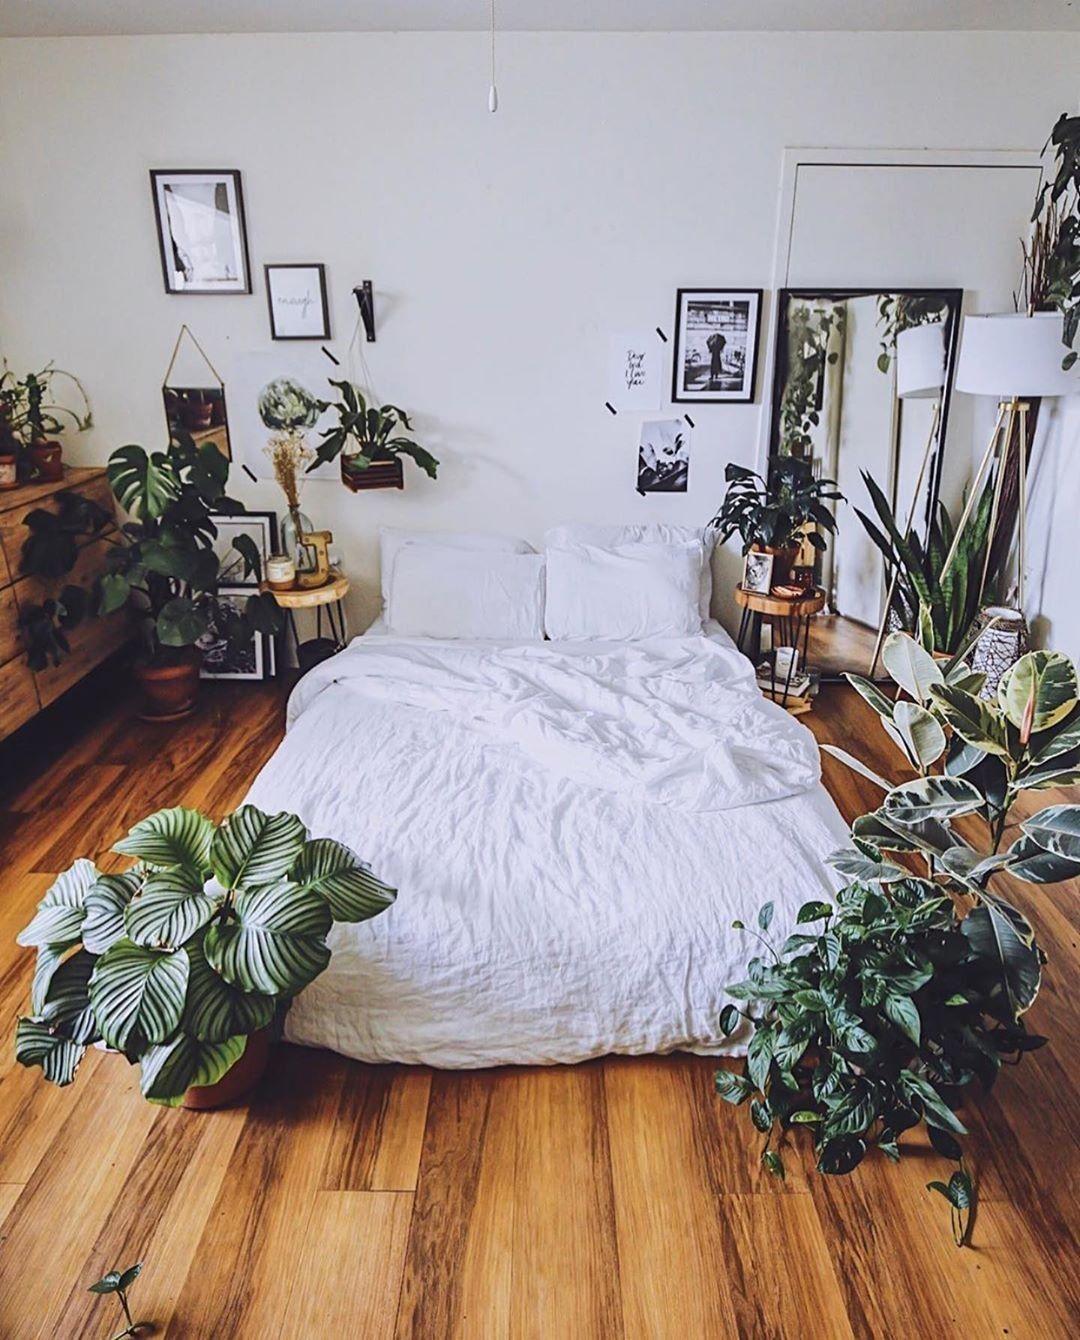 Modern Bohemian Bedroom Decor Ideas Modern Bohemian Bedroom Bedroom Decor Bohemian Bedroom Decor